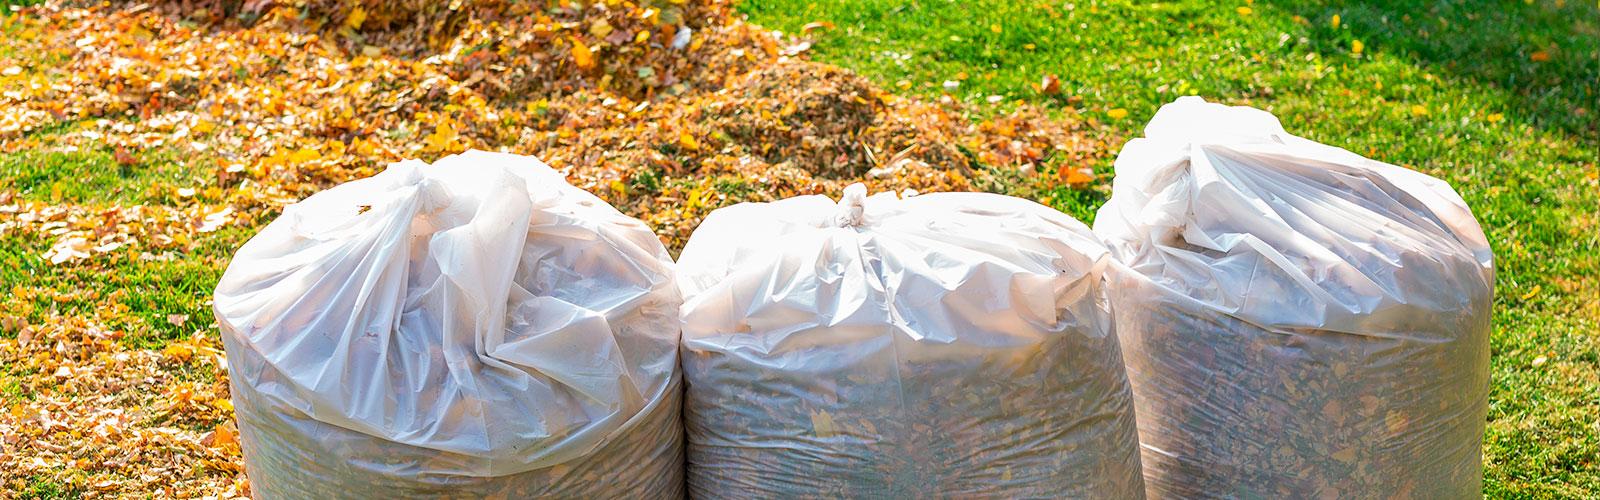 grünschnitt-laub-äste-greifswald-bäume-entsorgen